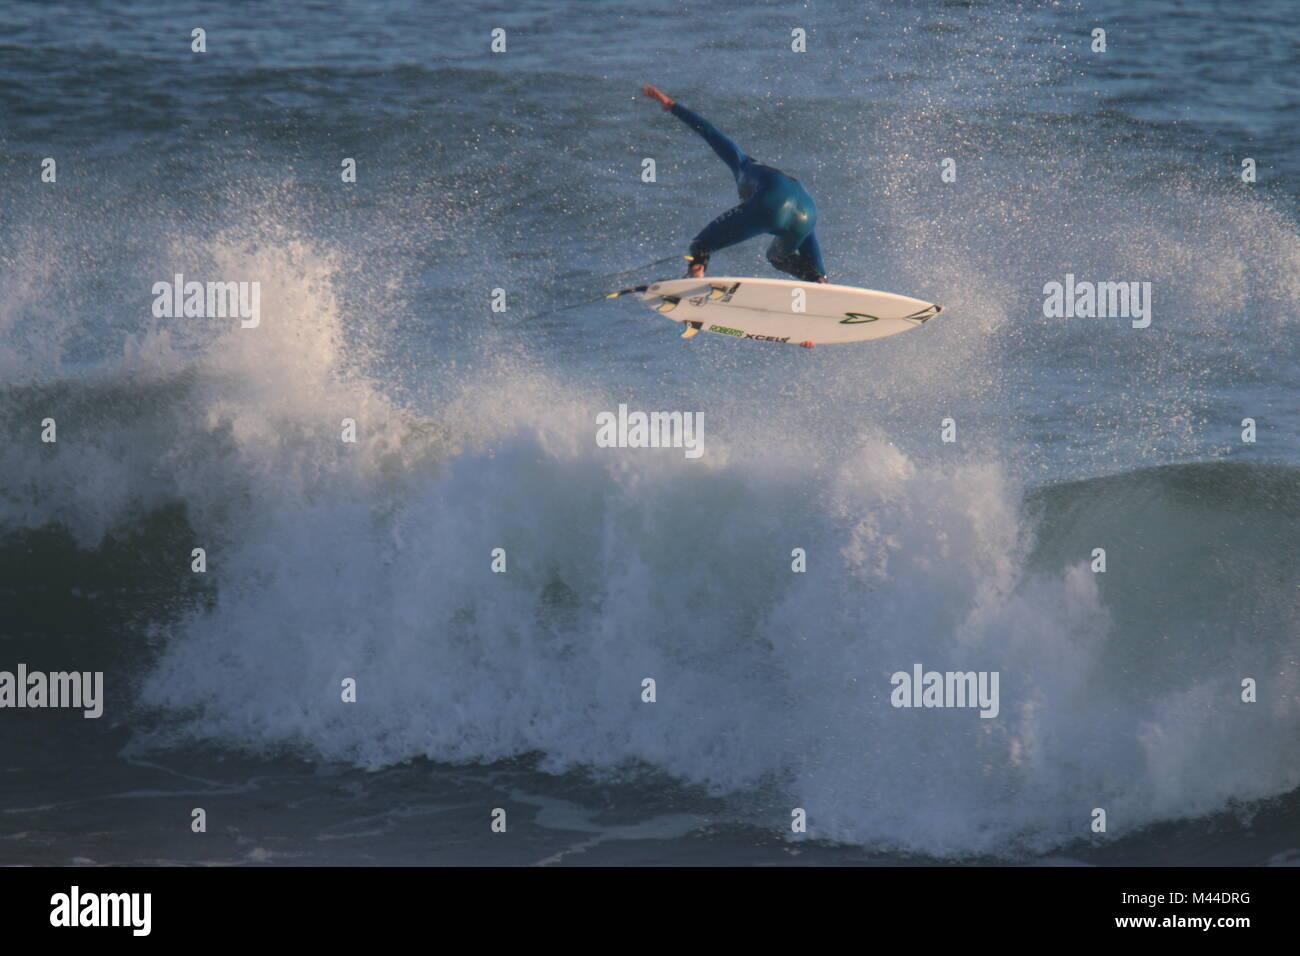 Surfing Rincon - Stock Image